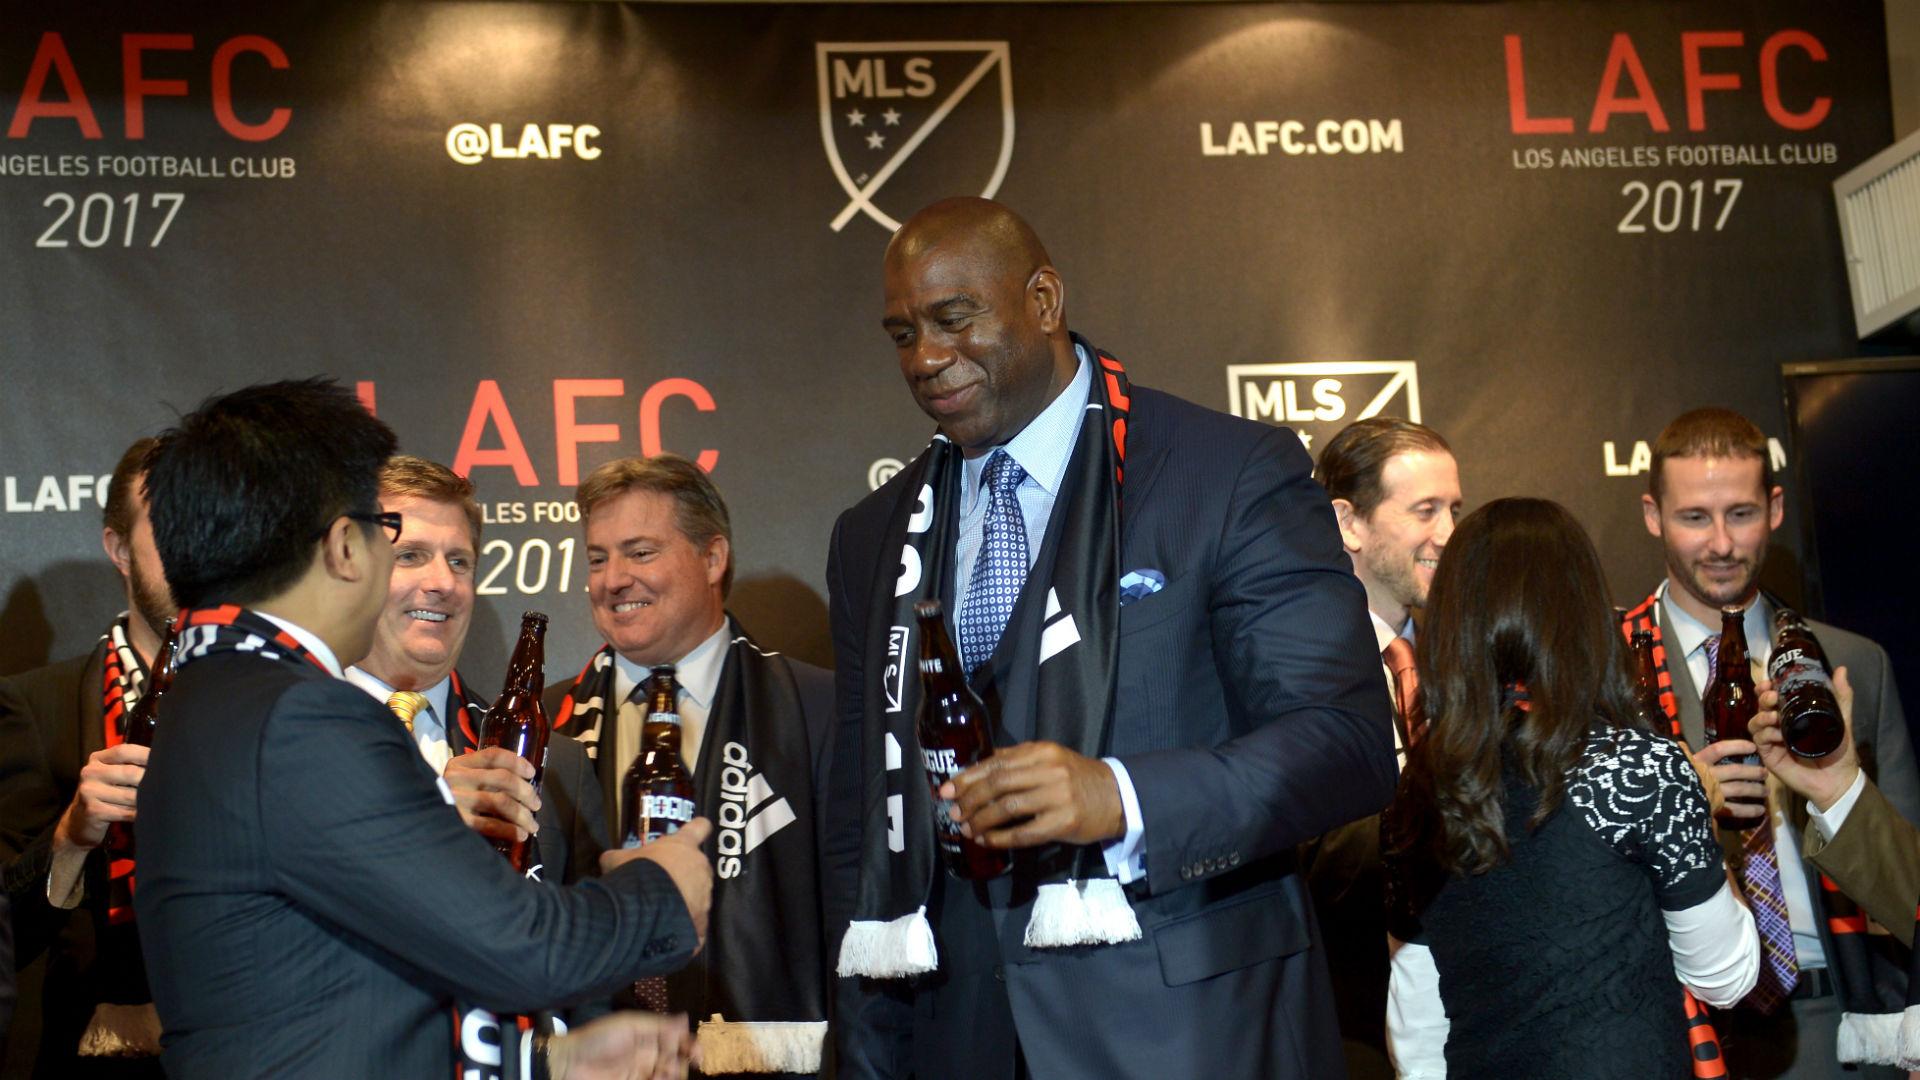 YouTube to Be Live TV Partner of New LA Soccer Team